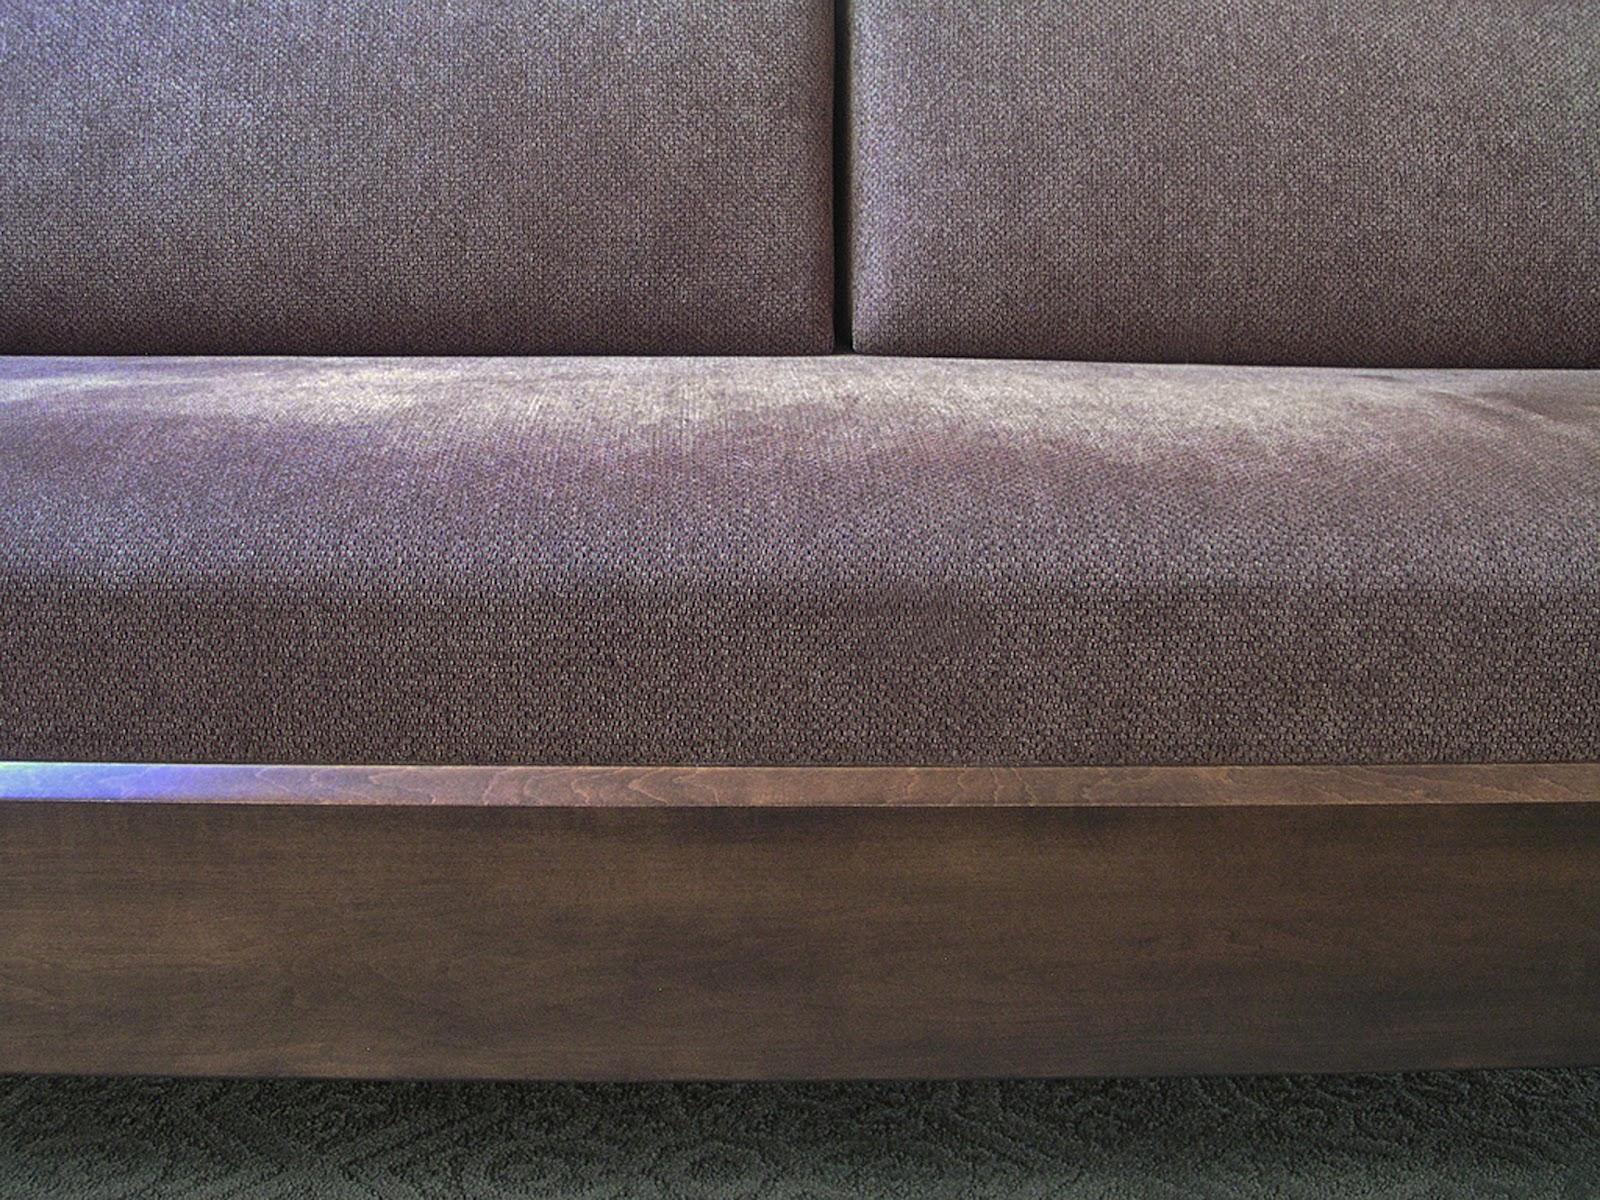 Amish Originals Furniture Co: Comfortable Seating title=